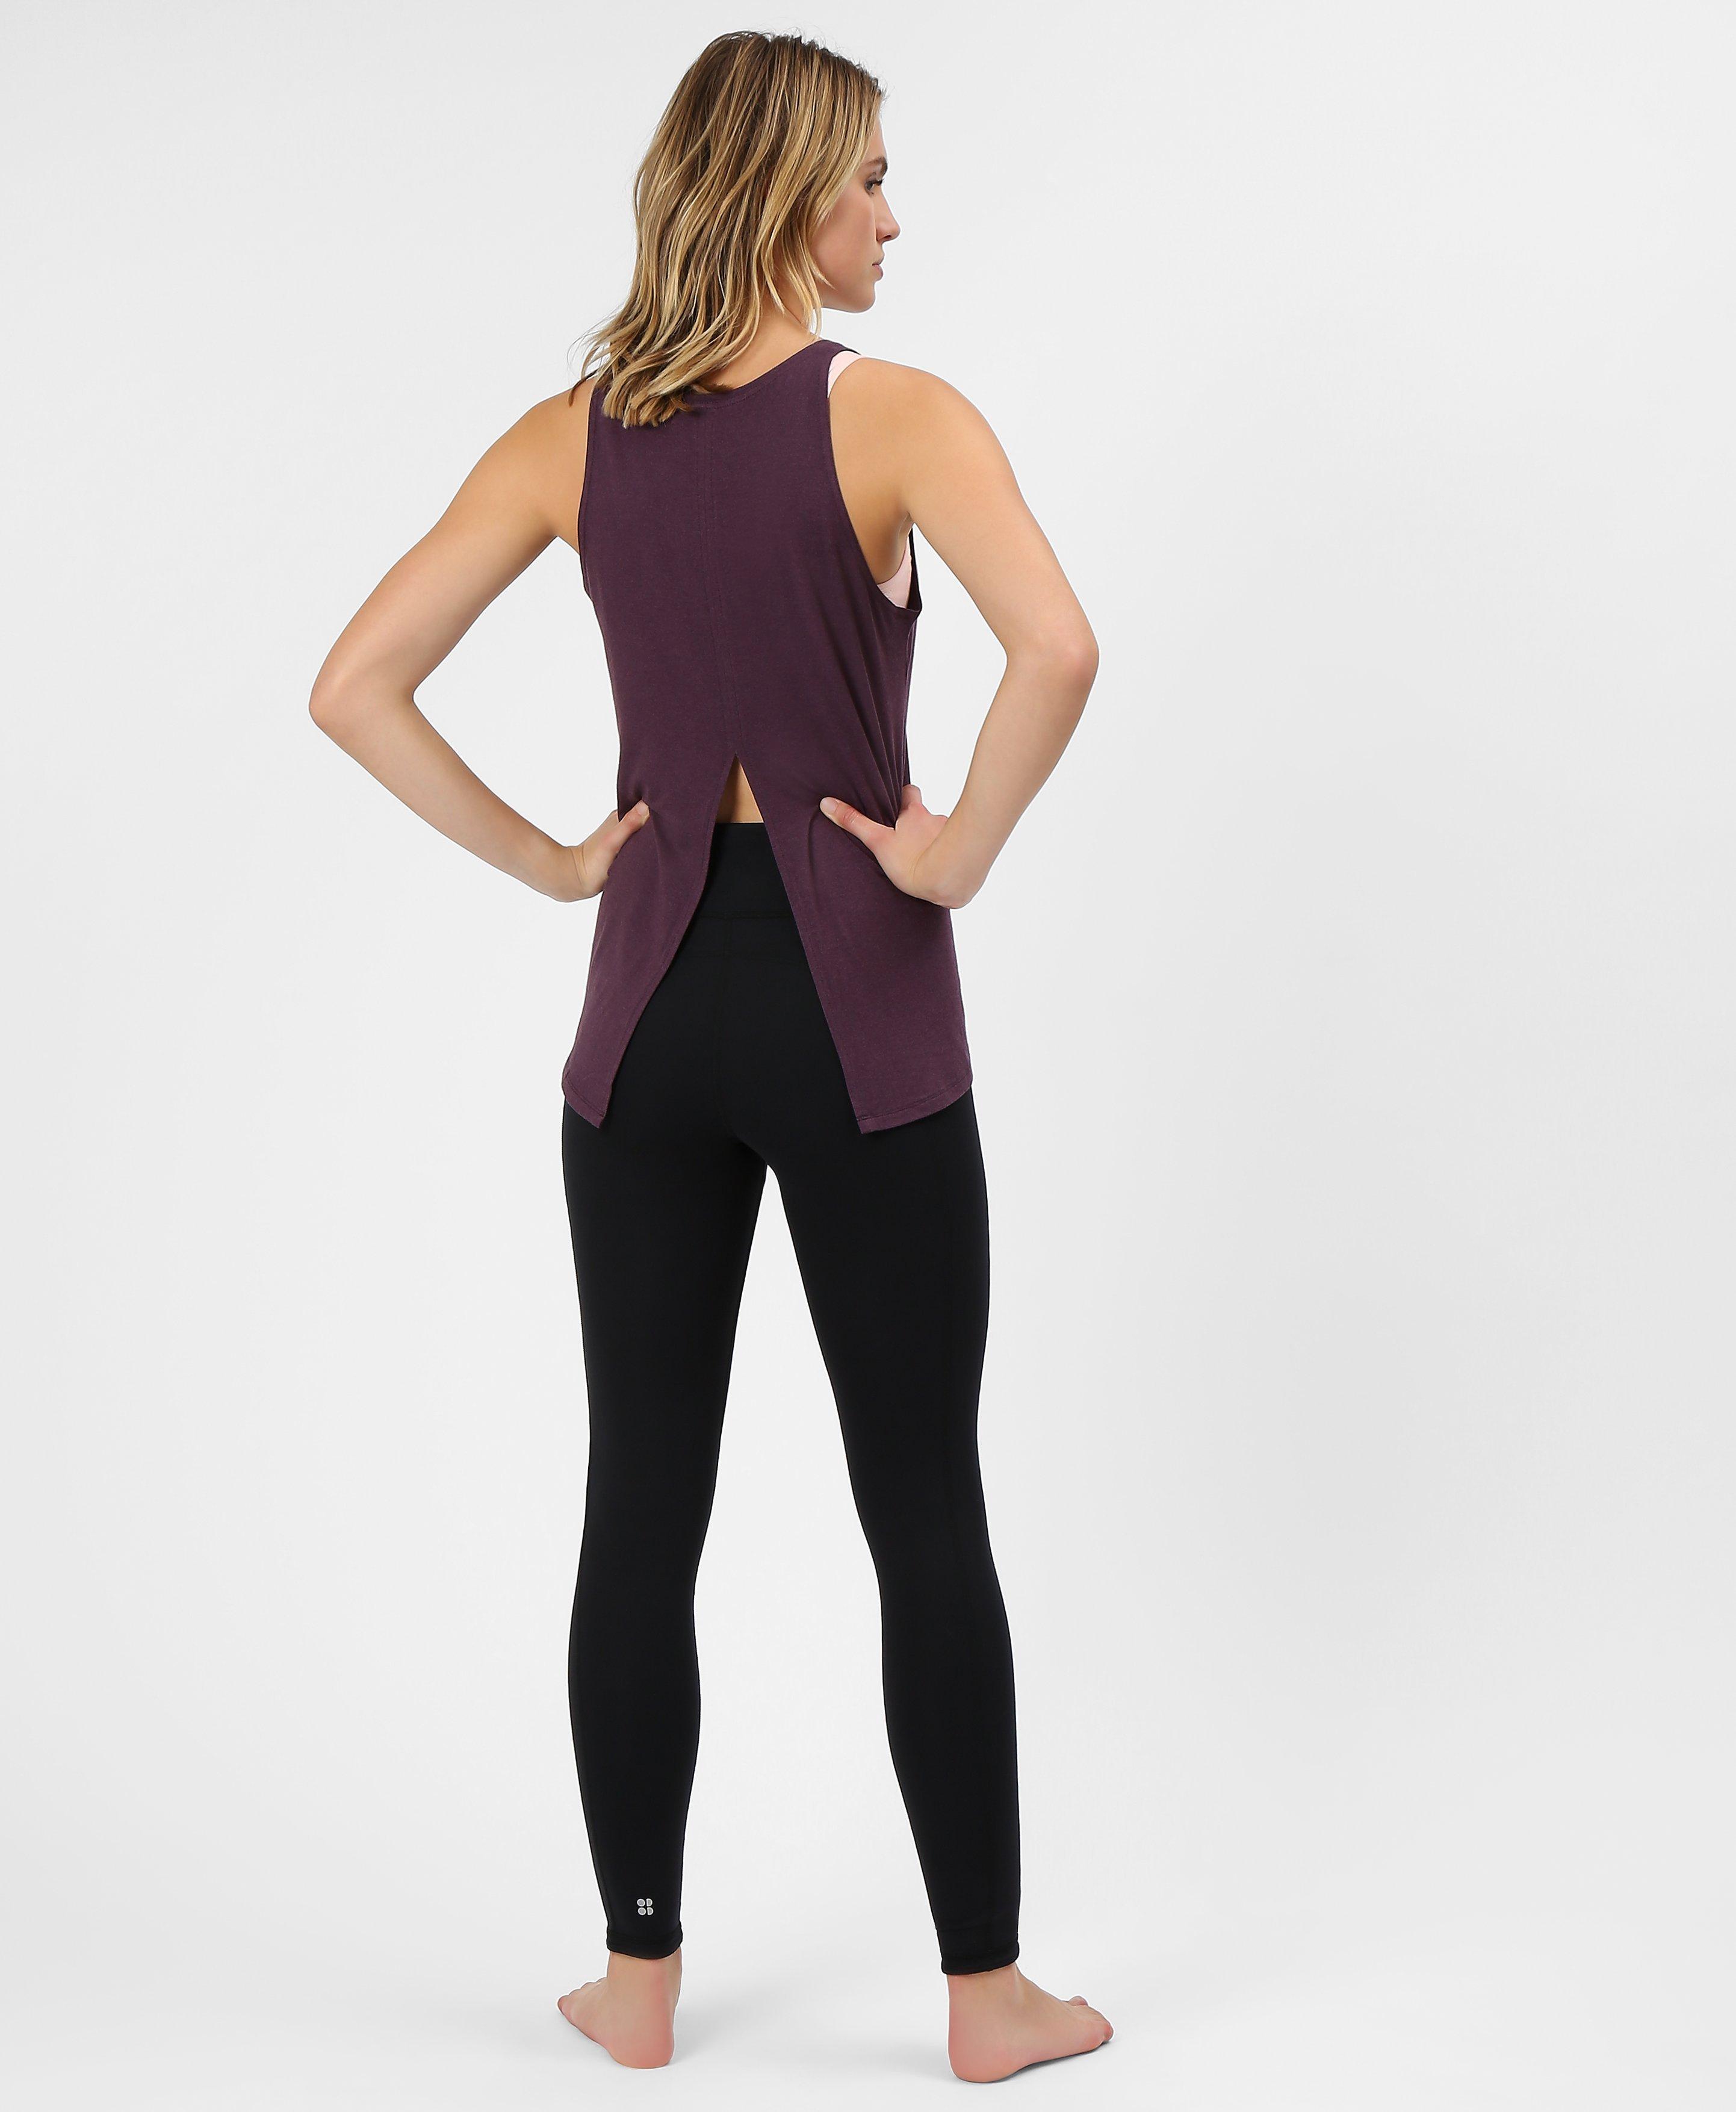 eggplant Winter Knit Printed Yoga Leggings